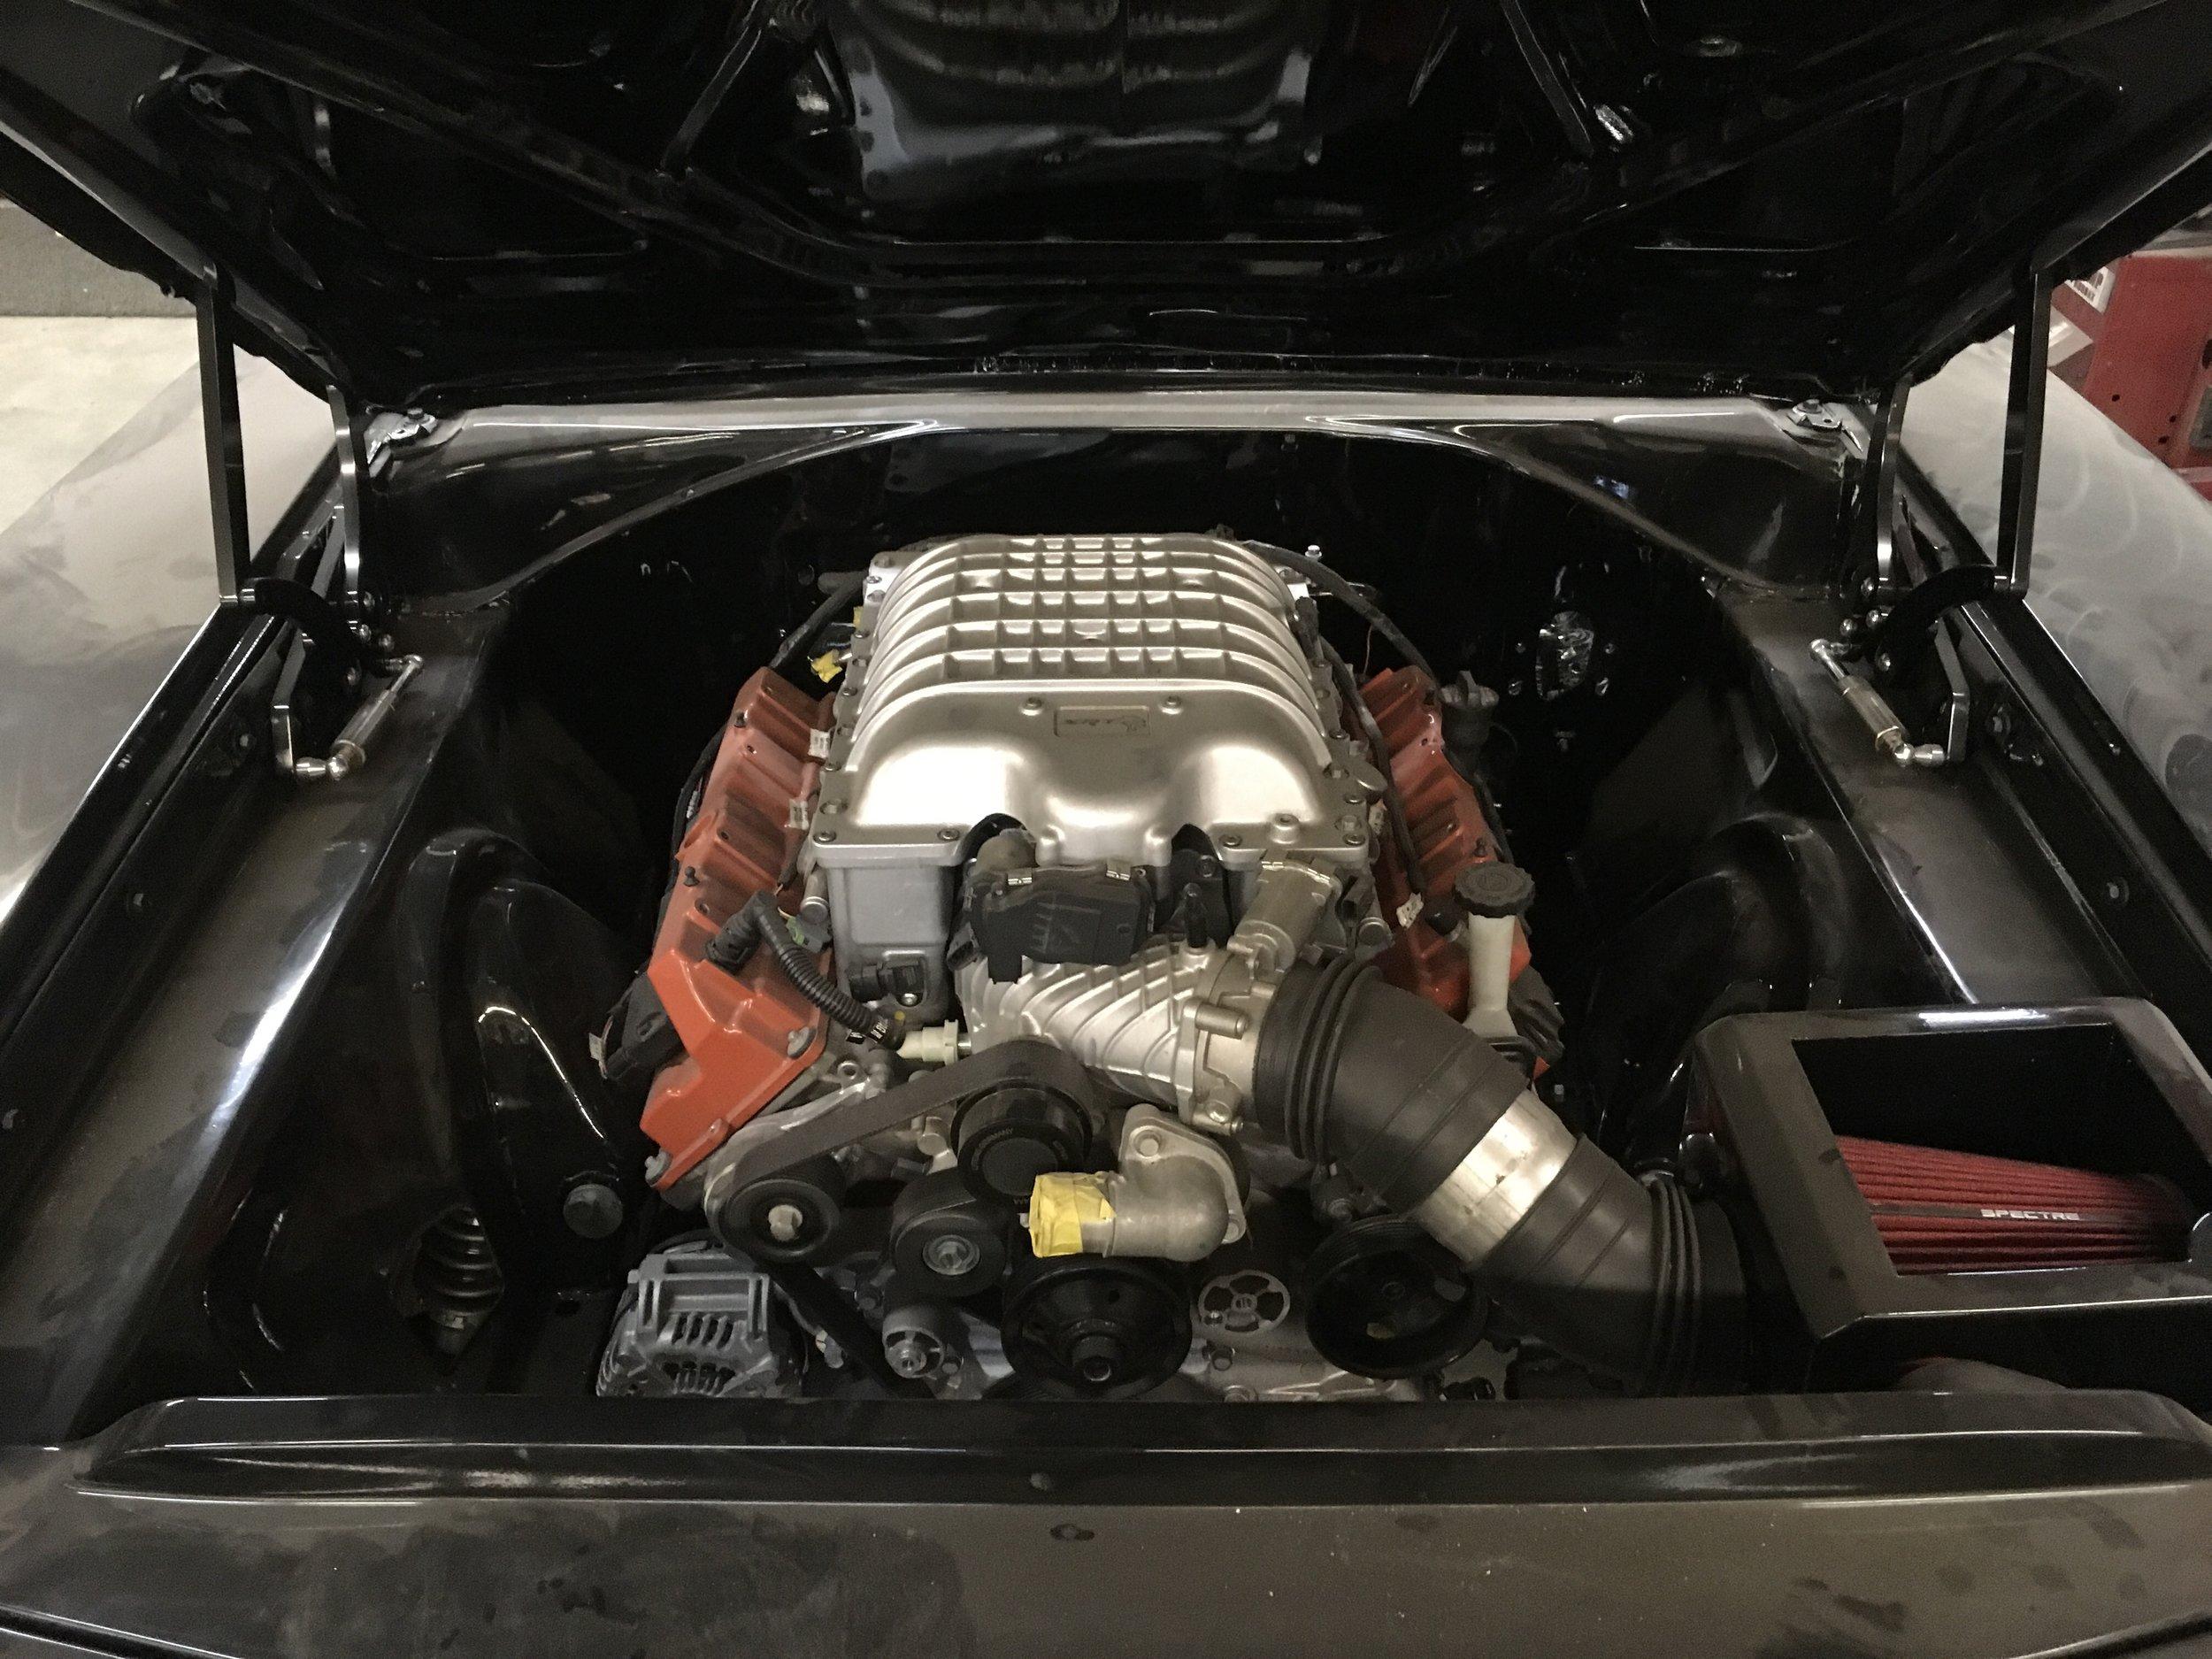 1968-Hell-Cat-Charger-minneapolis-hot-rod-custom-build-restoration-engine.jpg